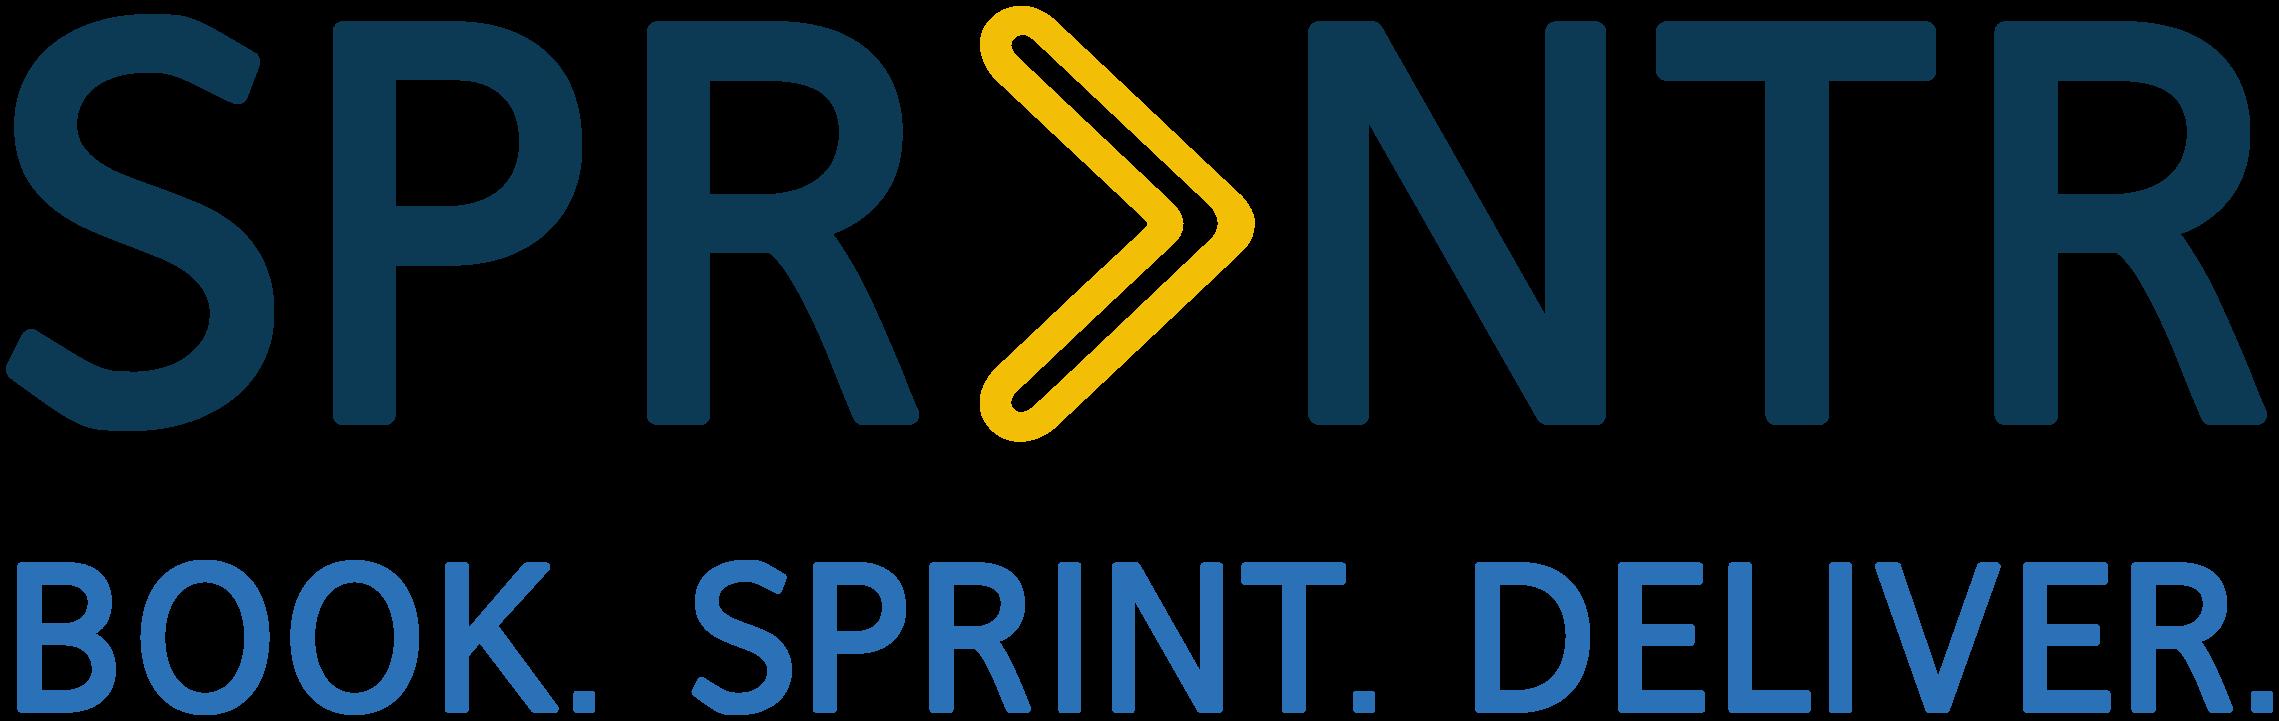 Sprintr logo